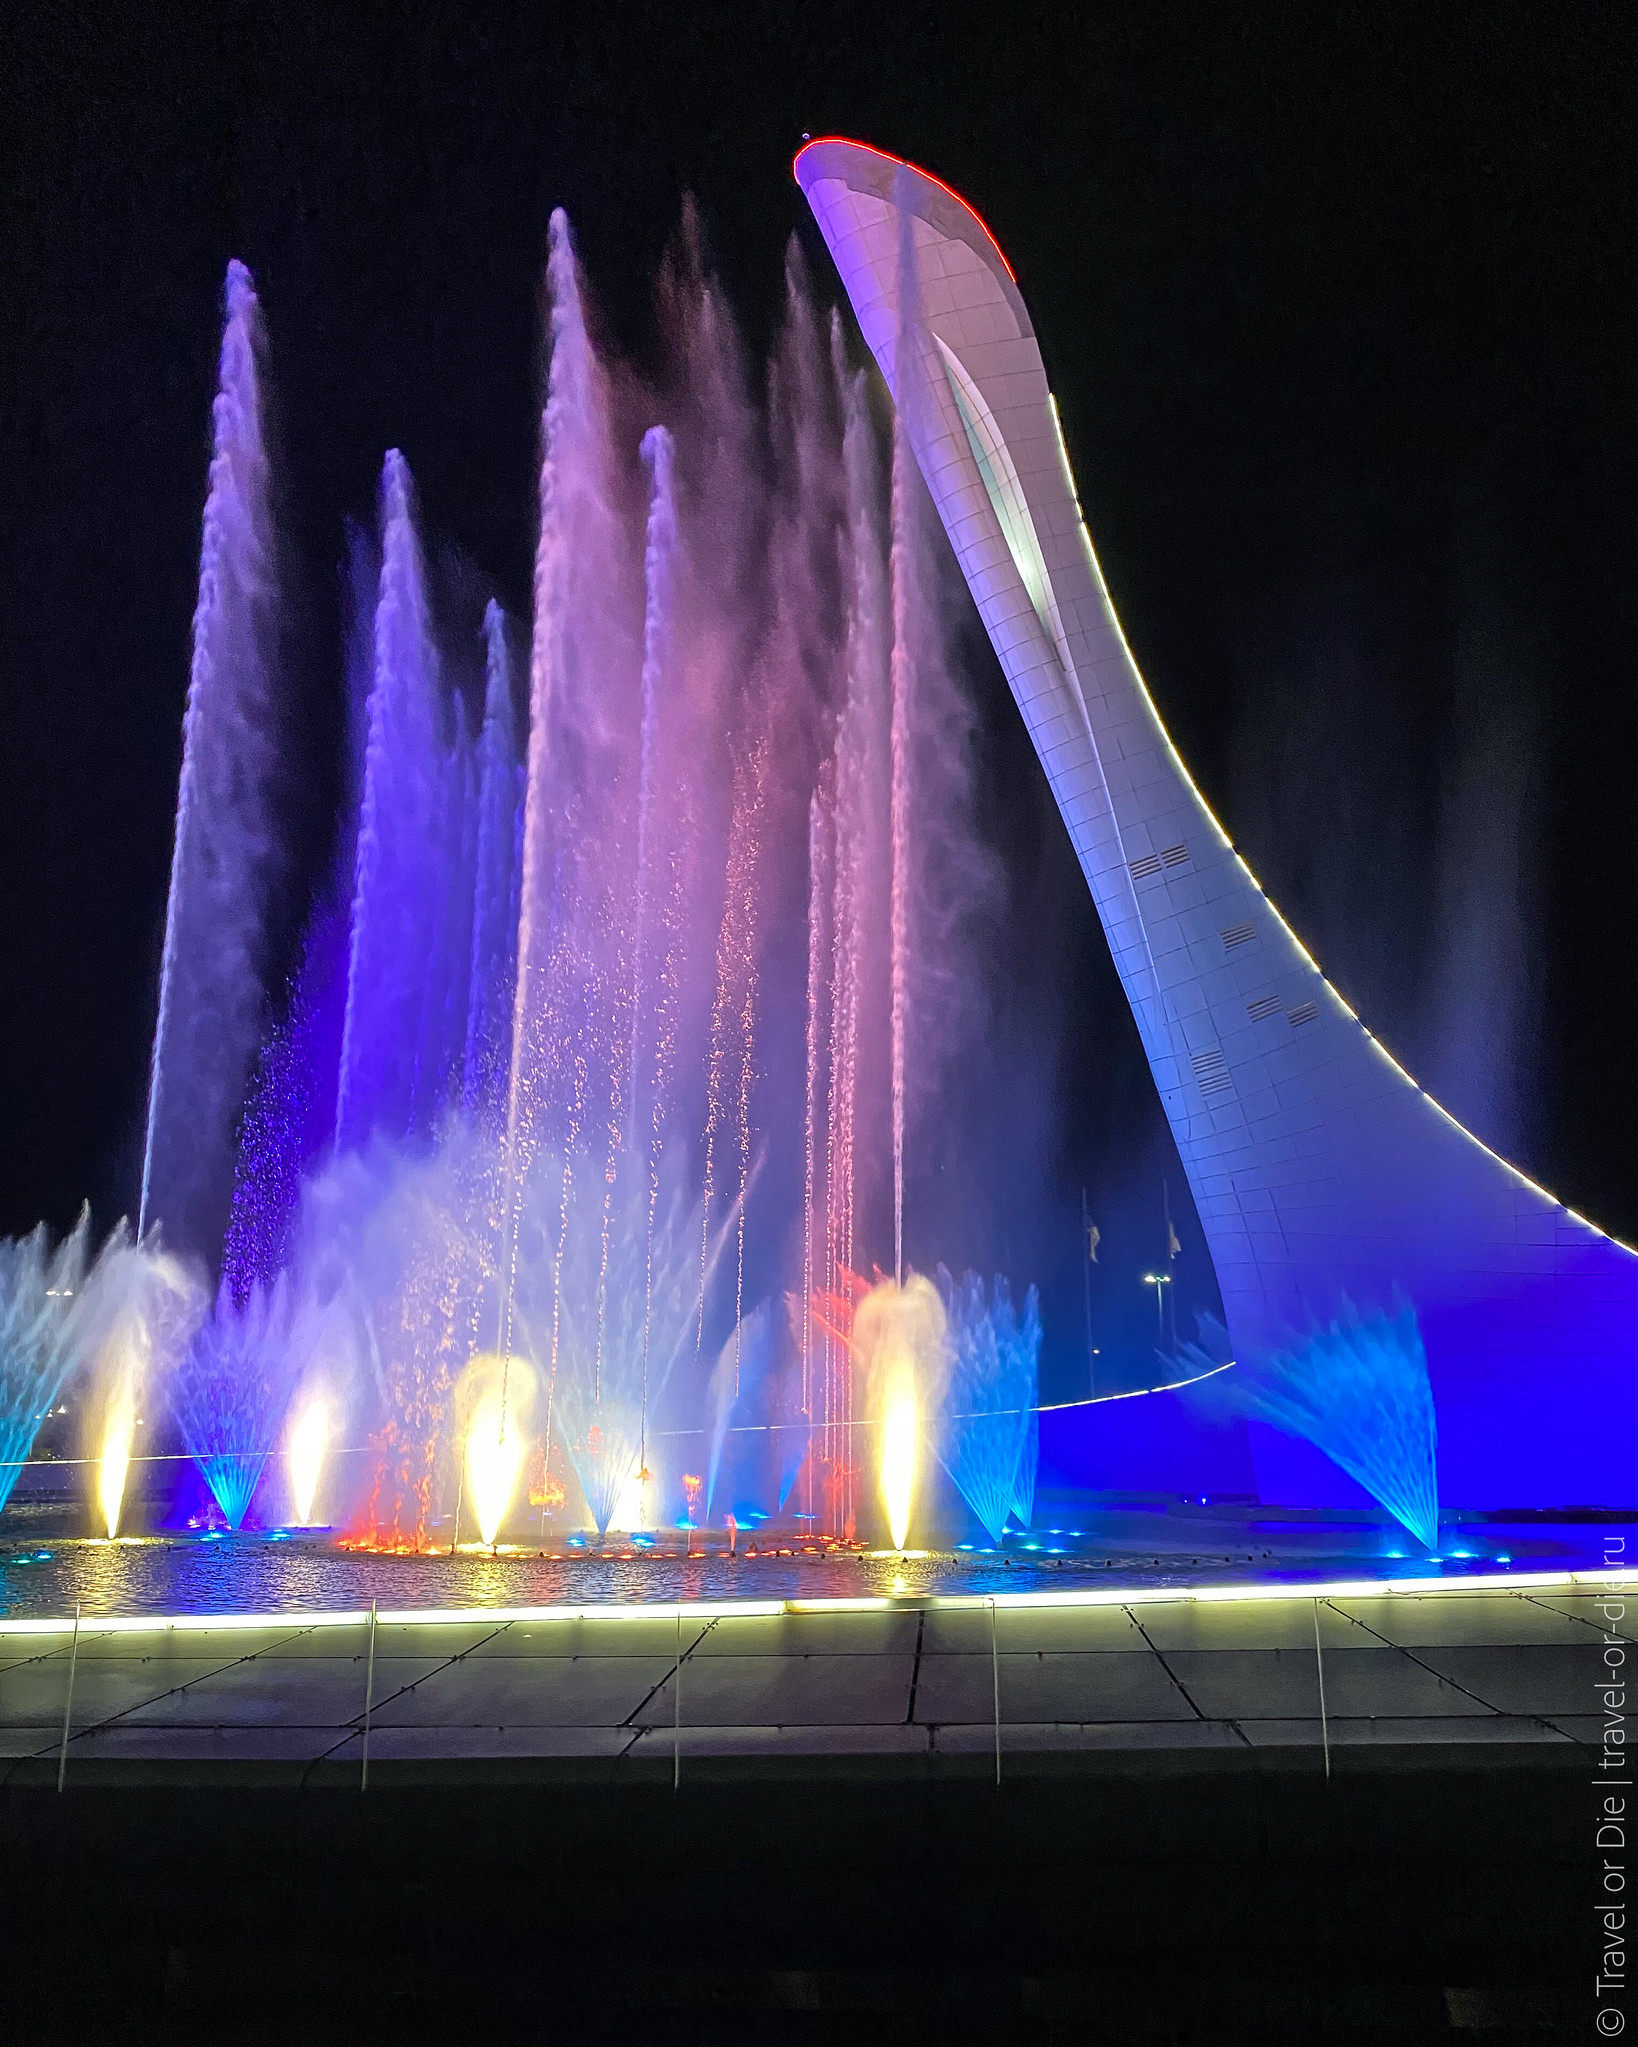 Singing-Fountain-Olympic-Park-Sochi-0925